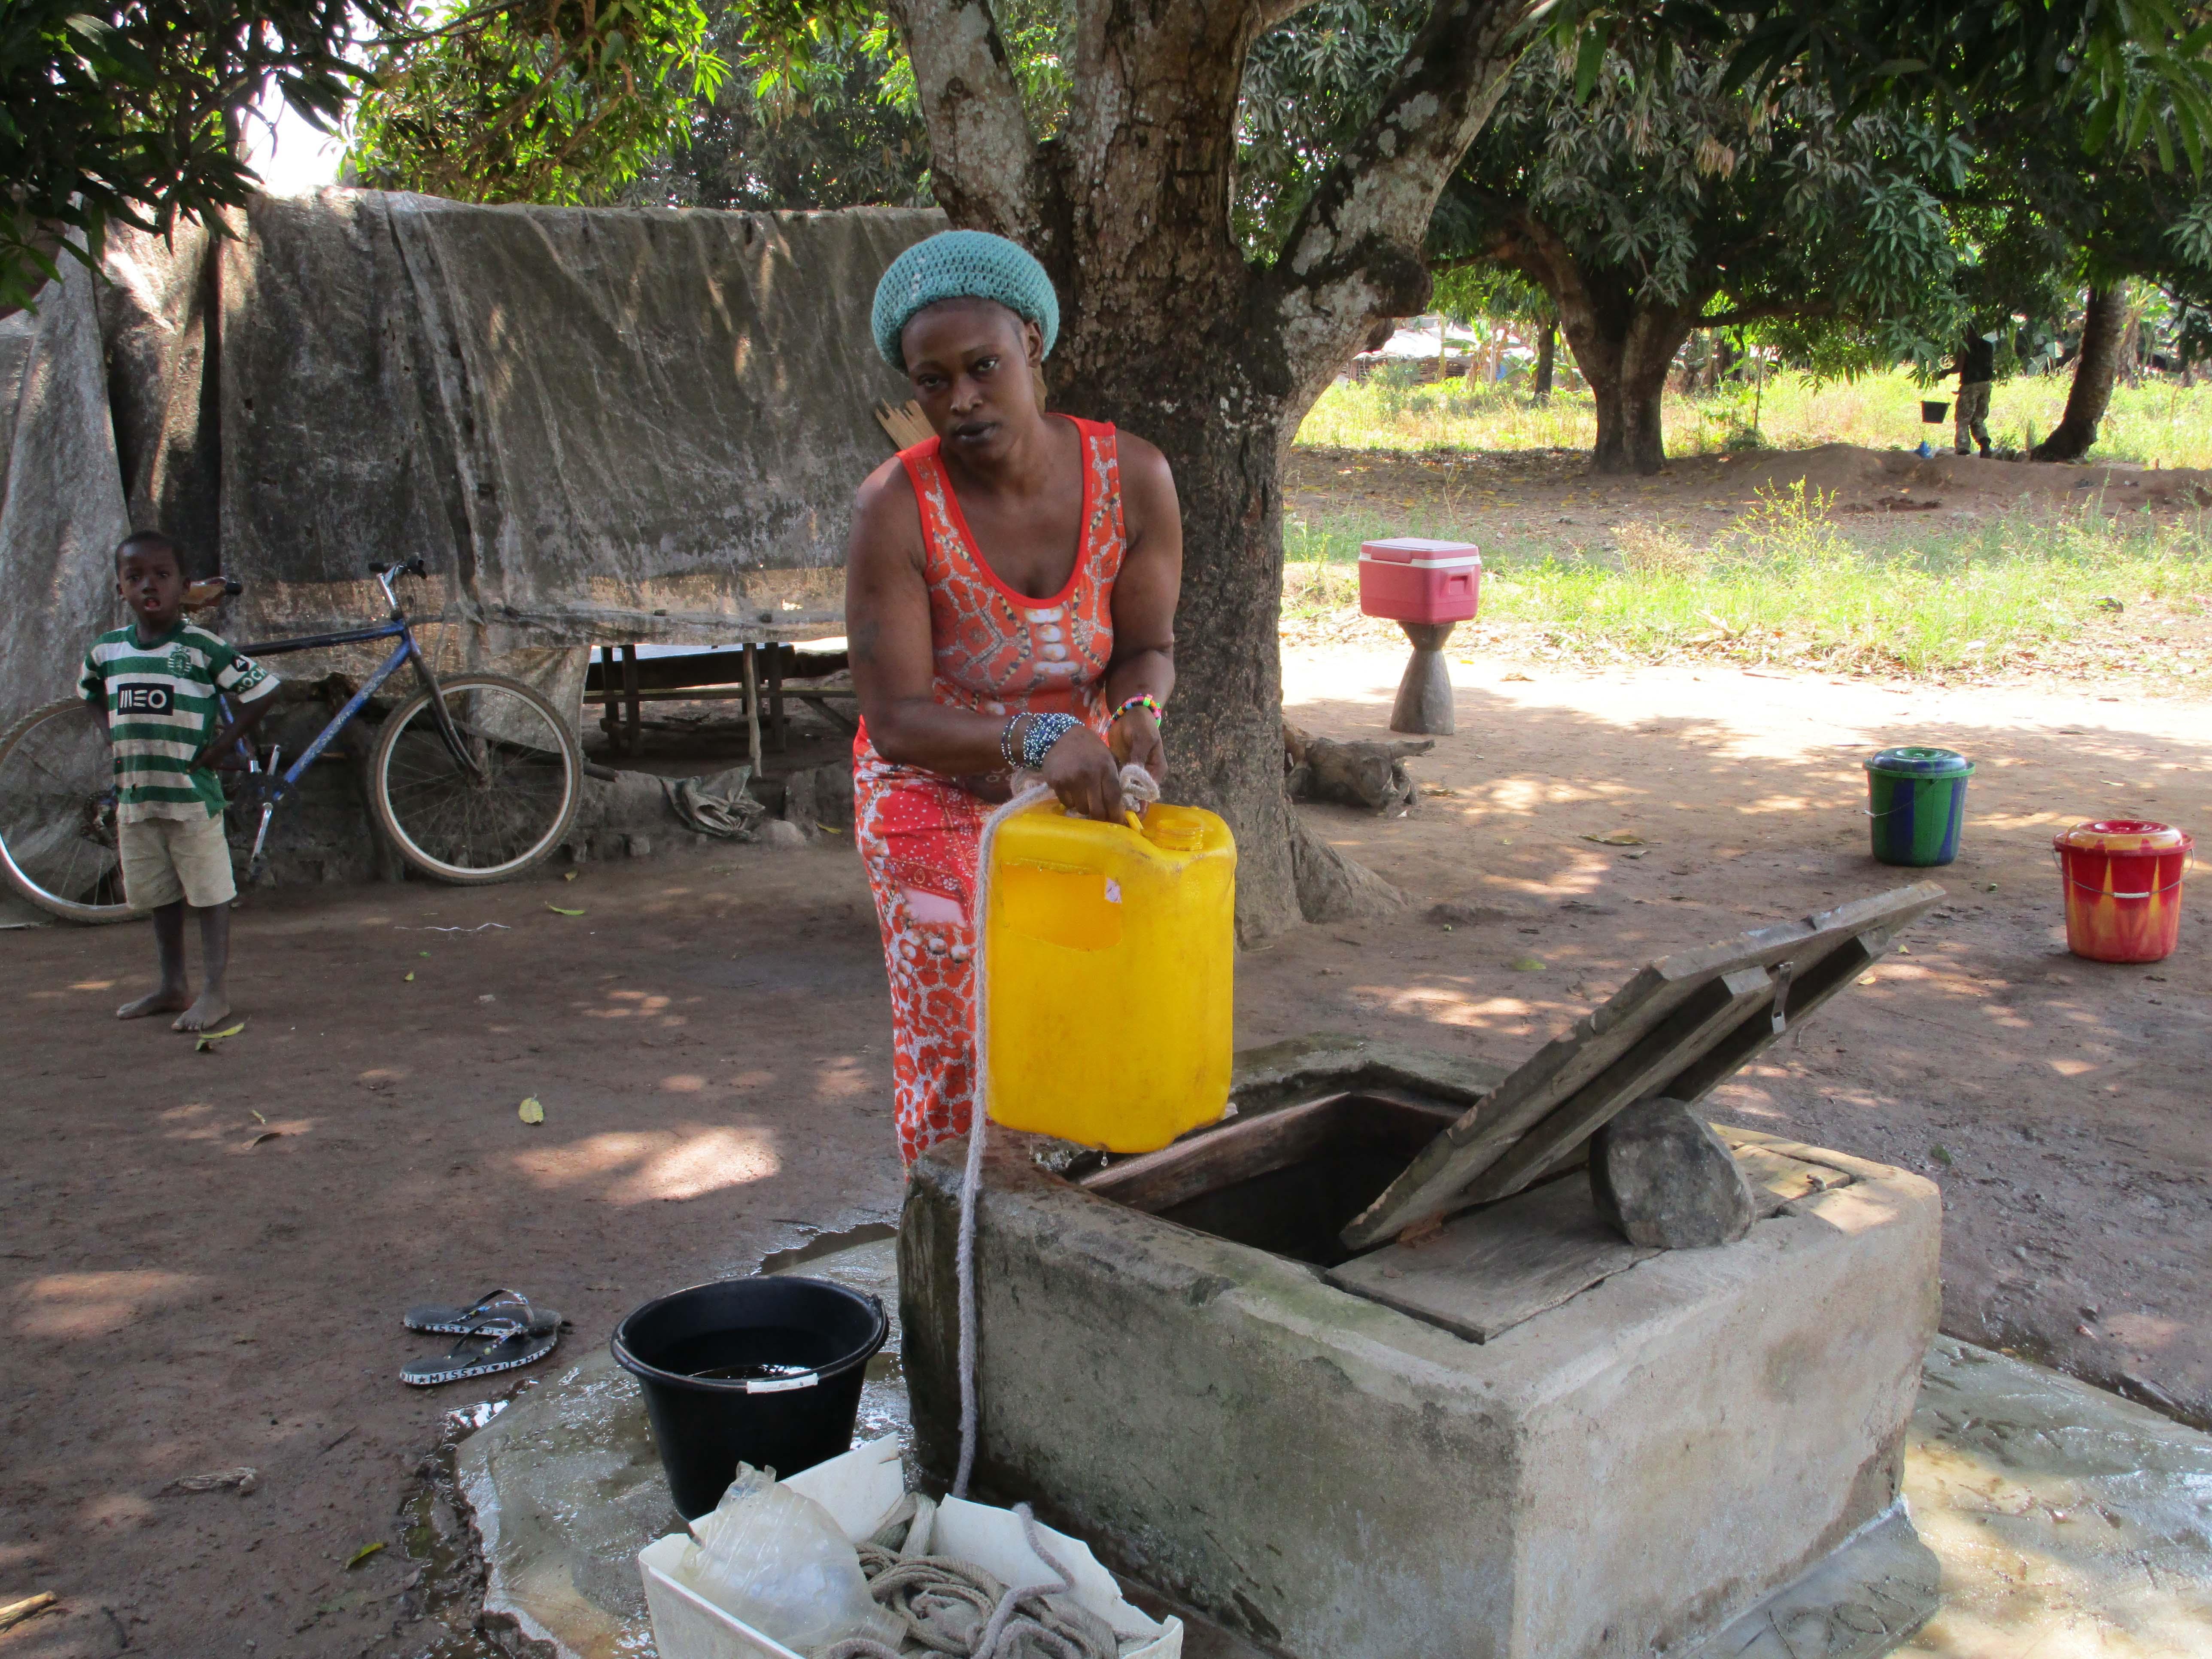 The Water Project : 1-sierraleone5102-alternative-water-source